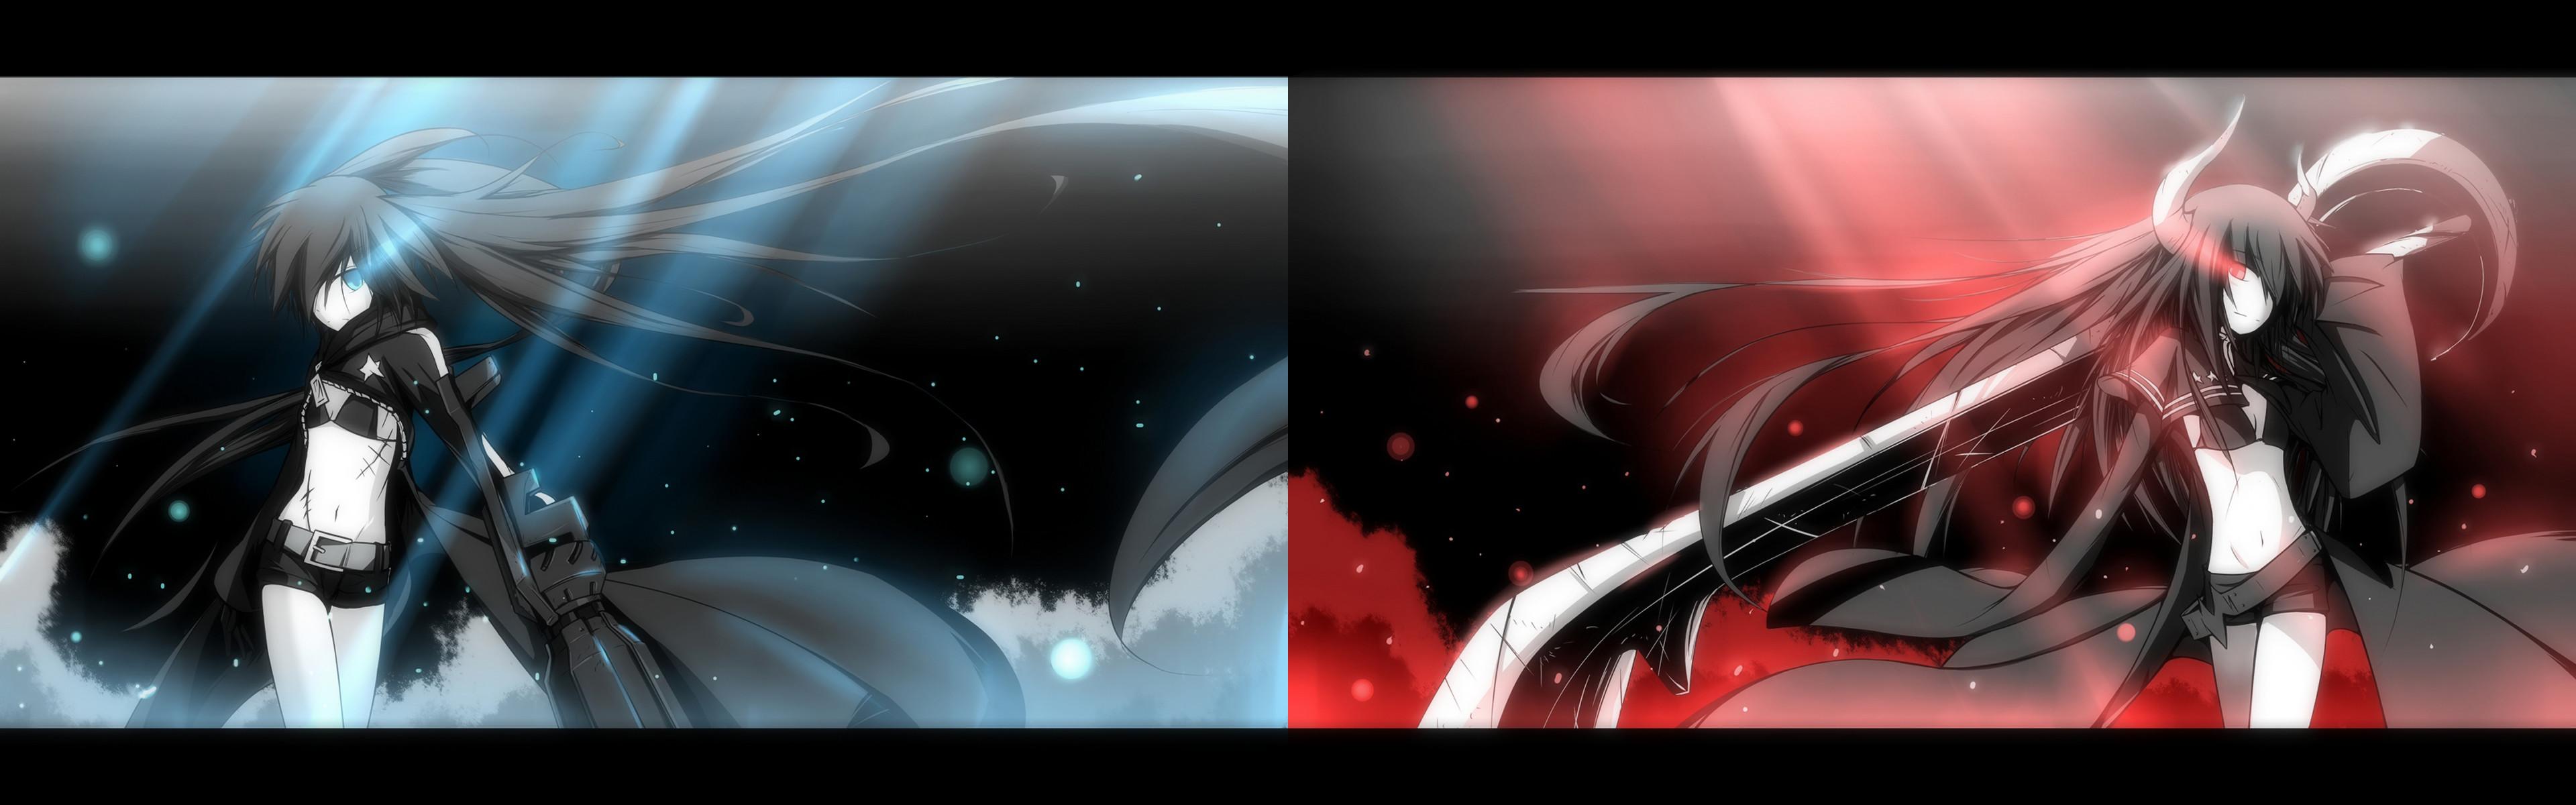 43 Anime Dual Monitor